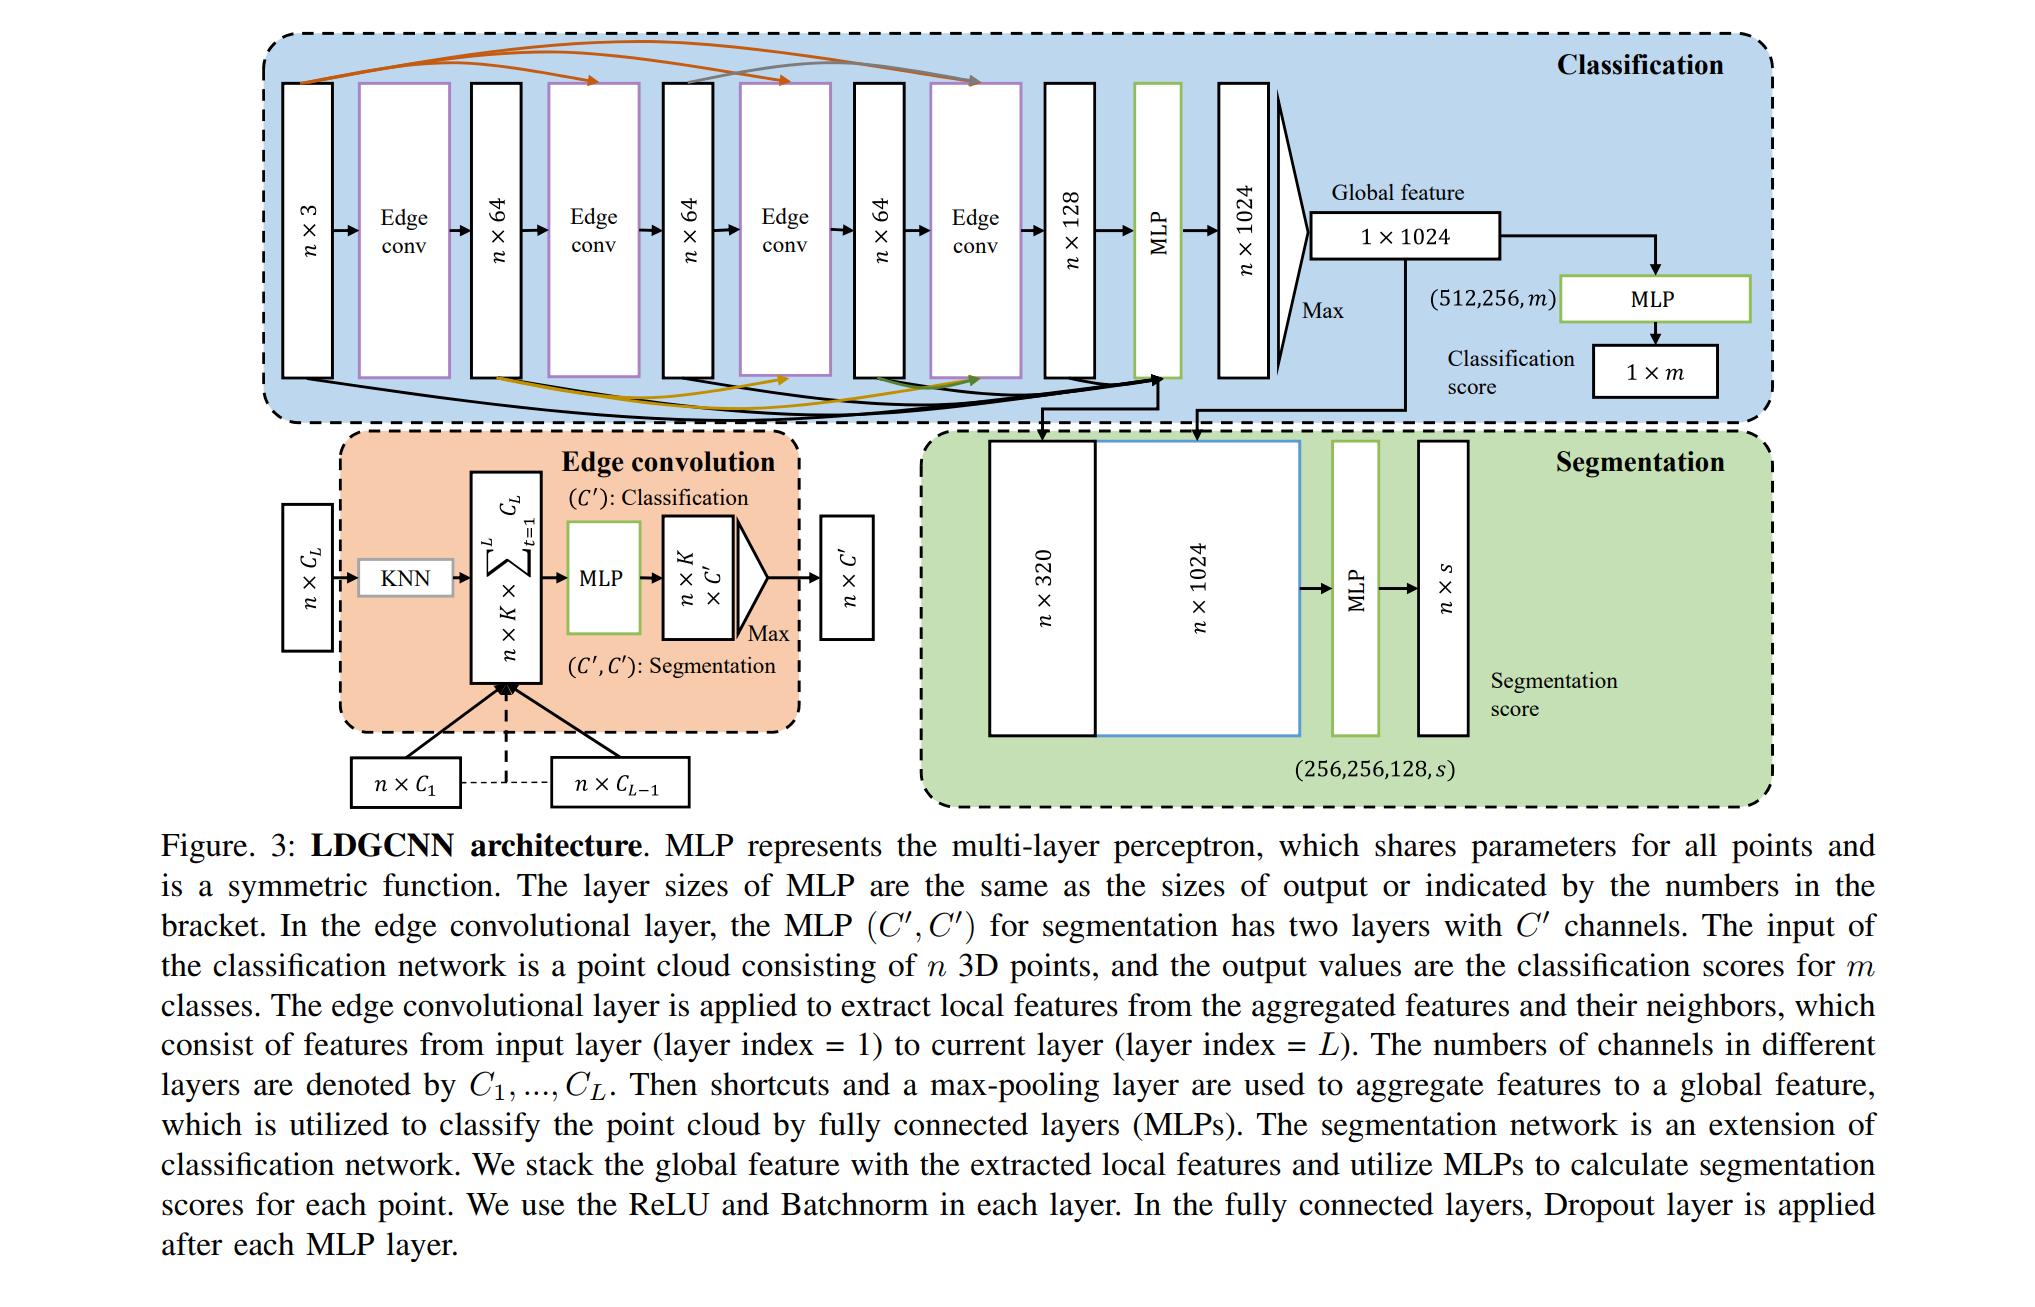 архитектура Linked DGCNN